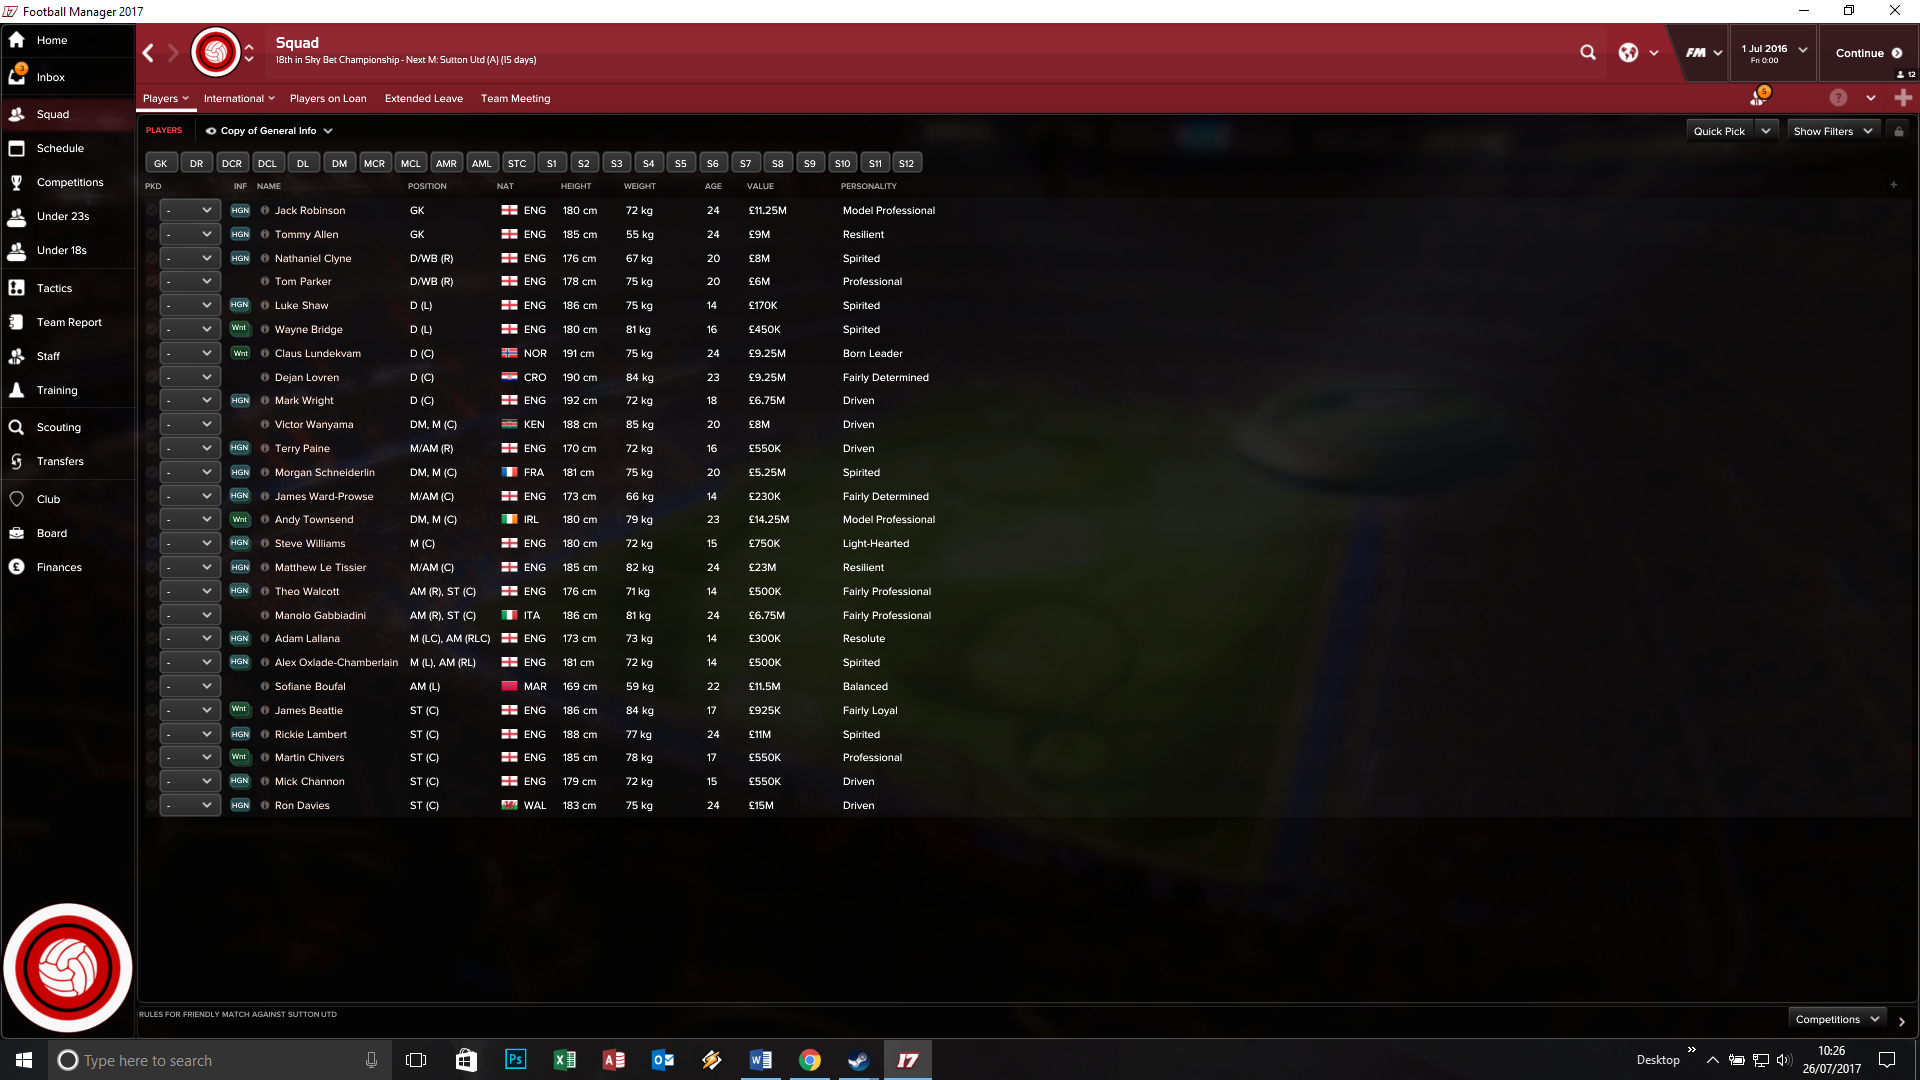 Southampton_Squad.png